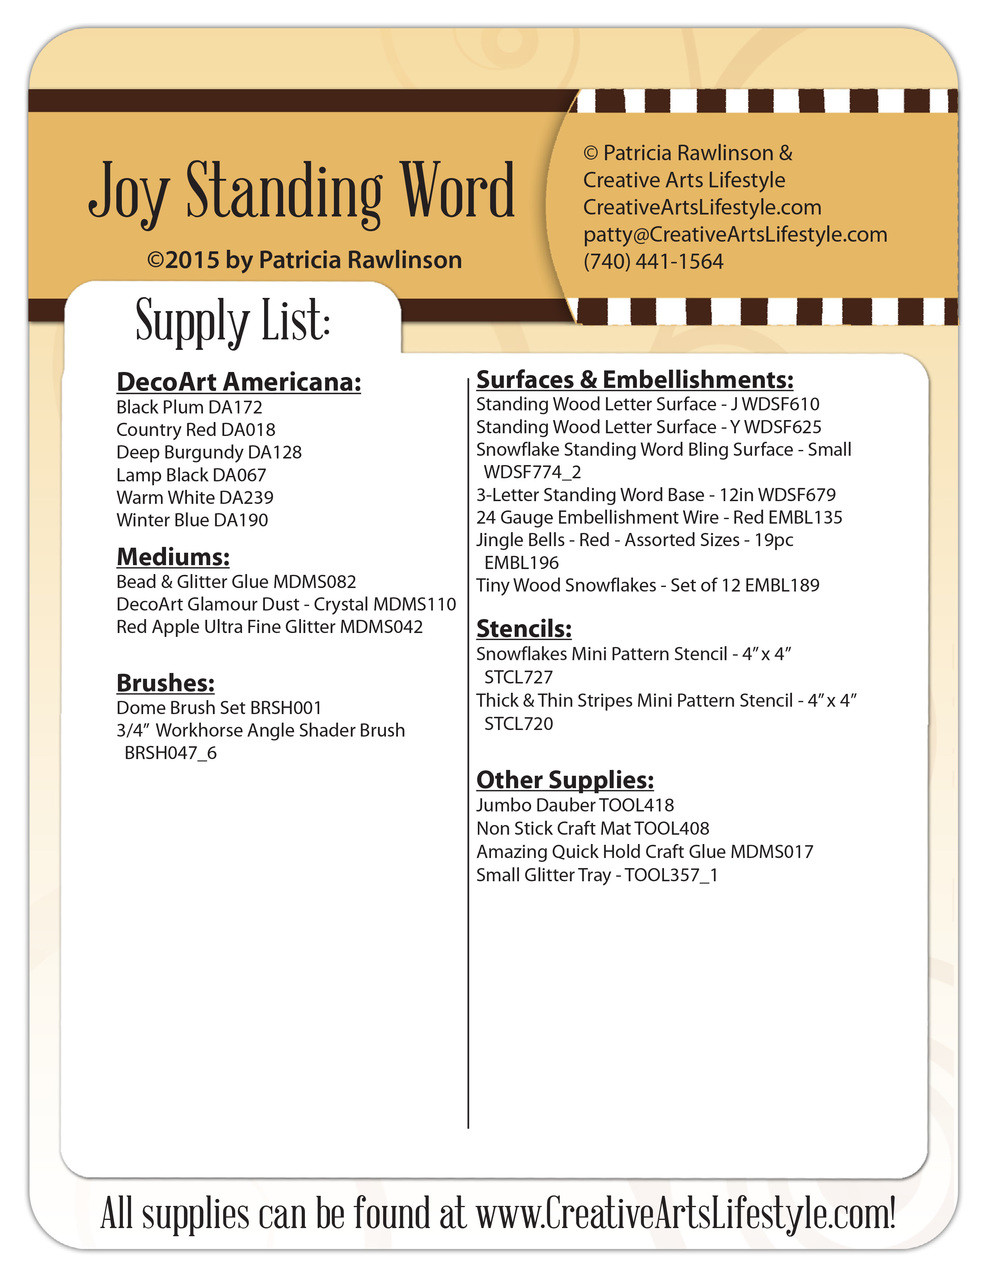 Joy Standing Word Pattern Packet - Patricia Rawlinson